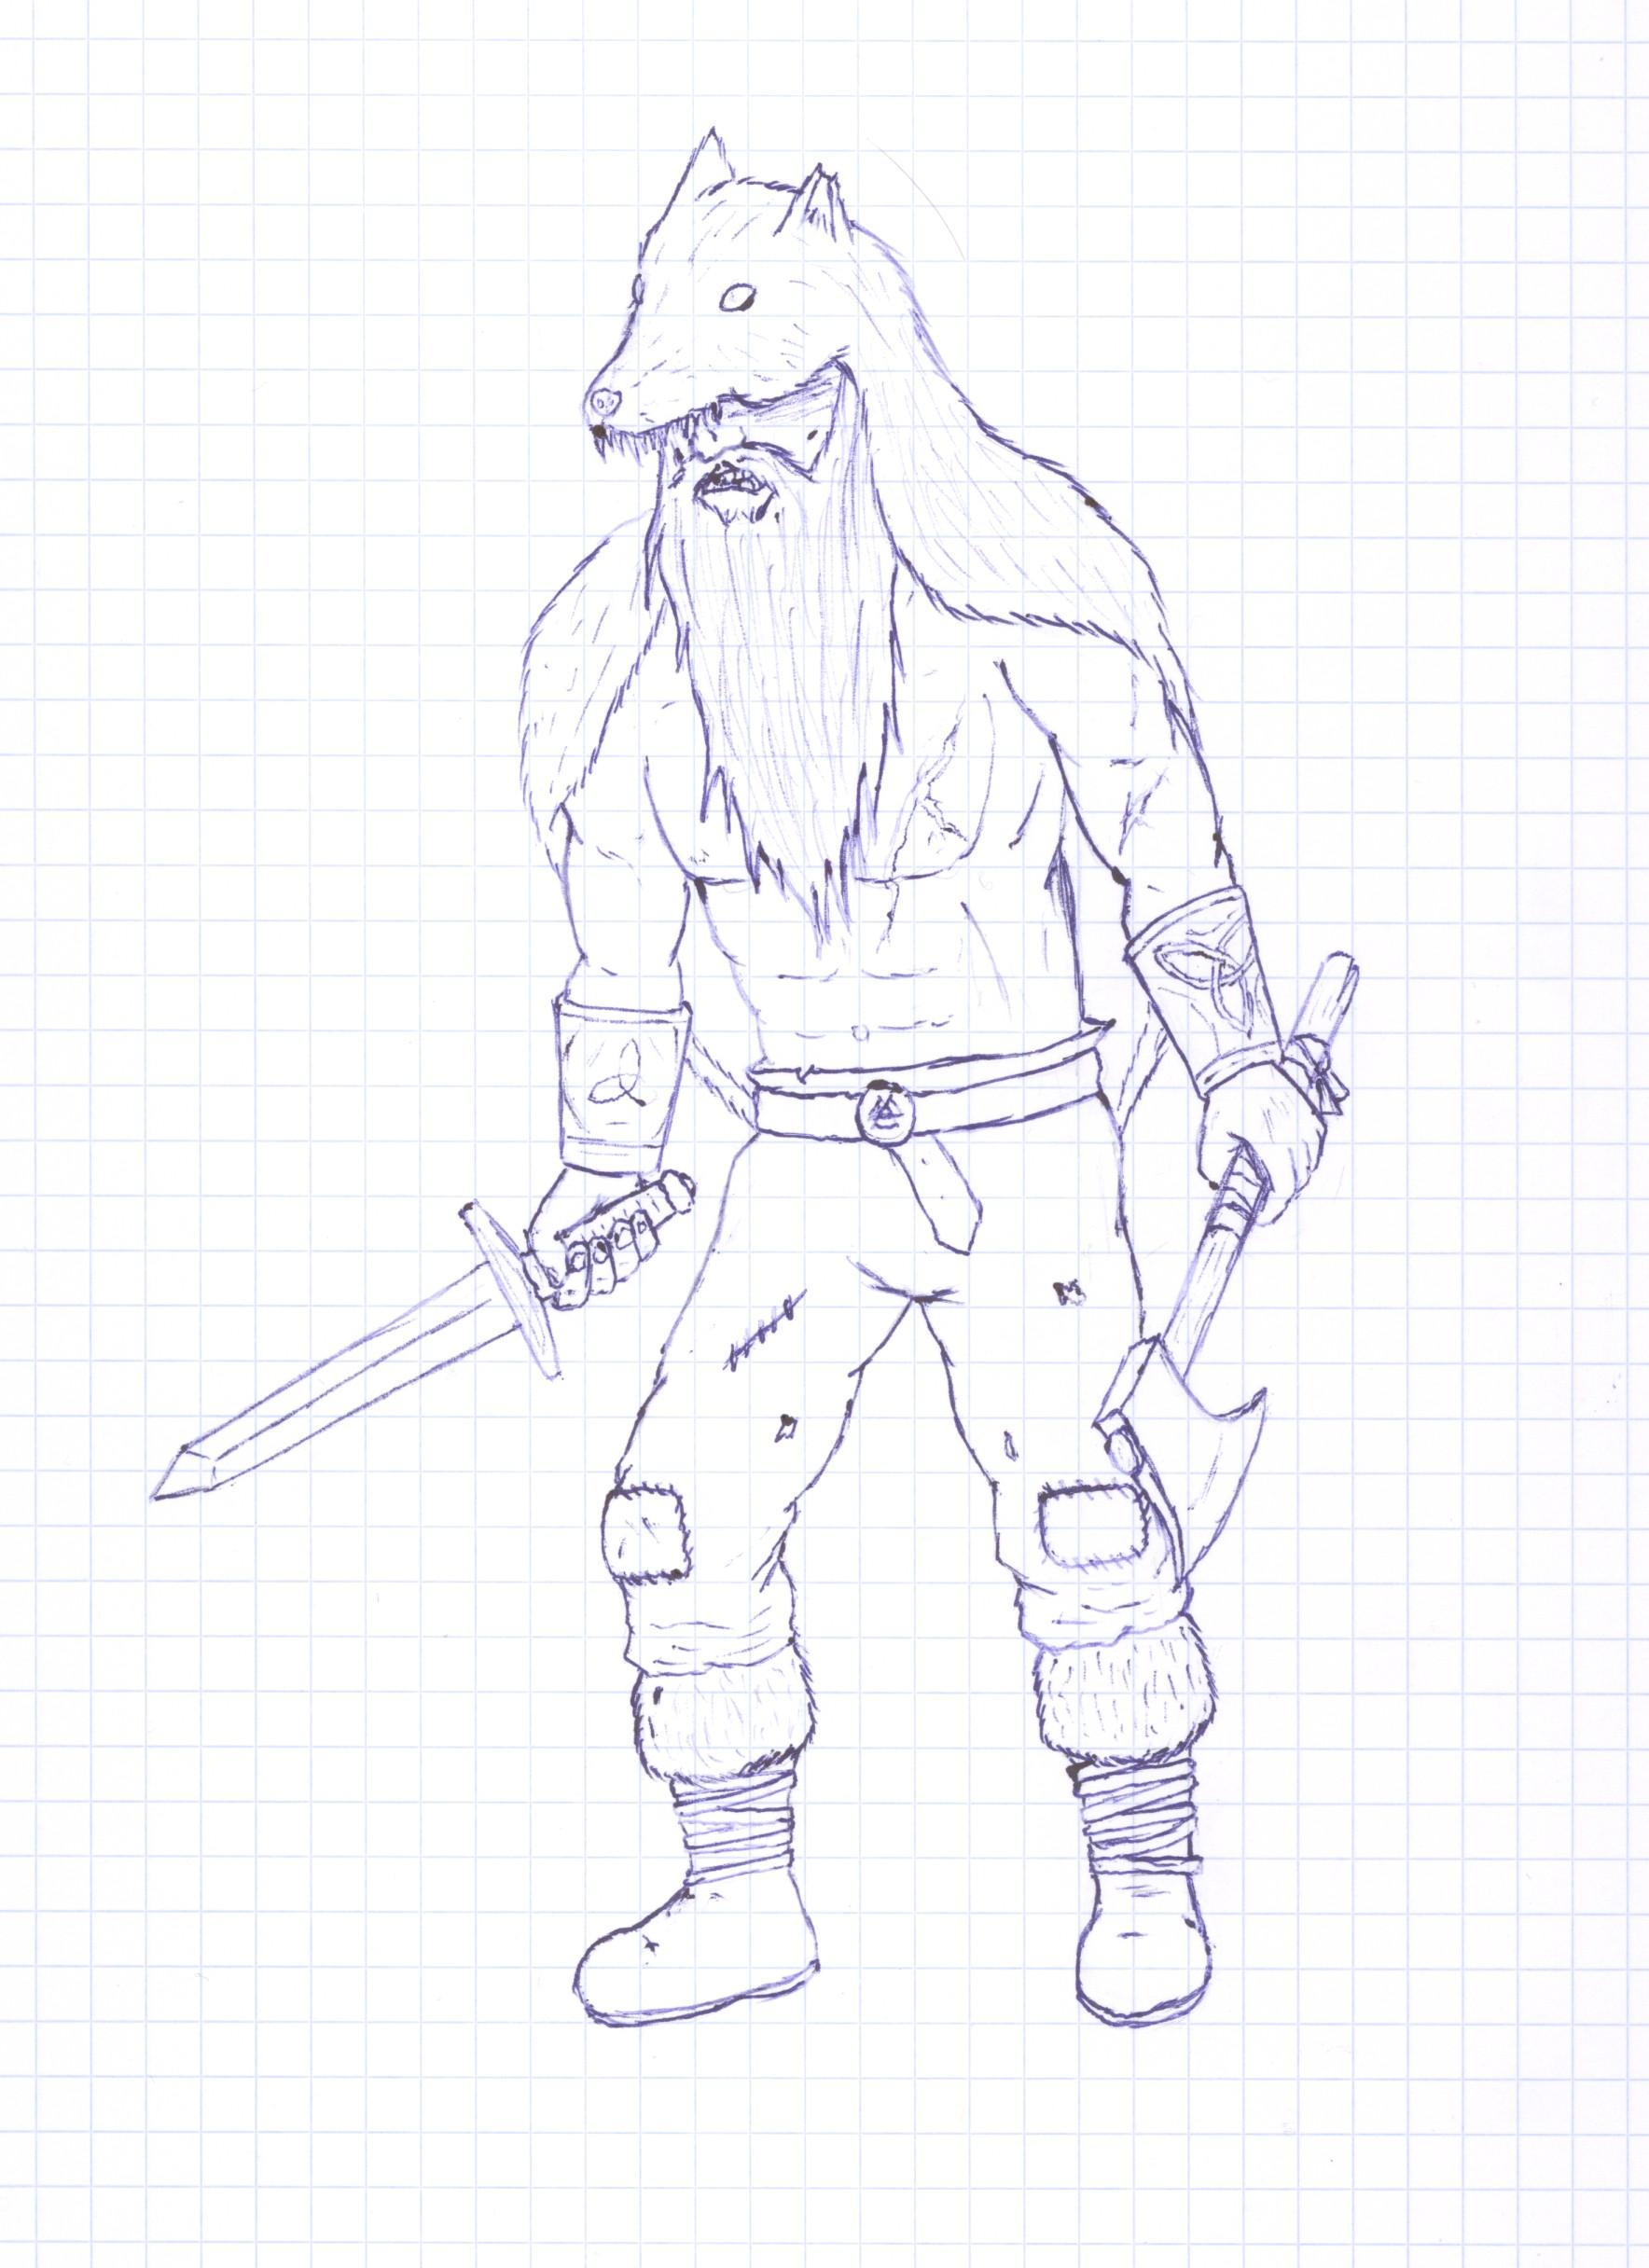 _zerker_doodle_by_thomas133-da3mapa.jpg